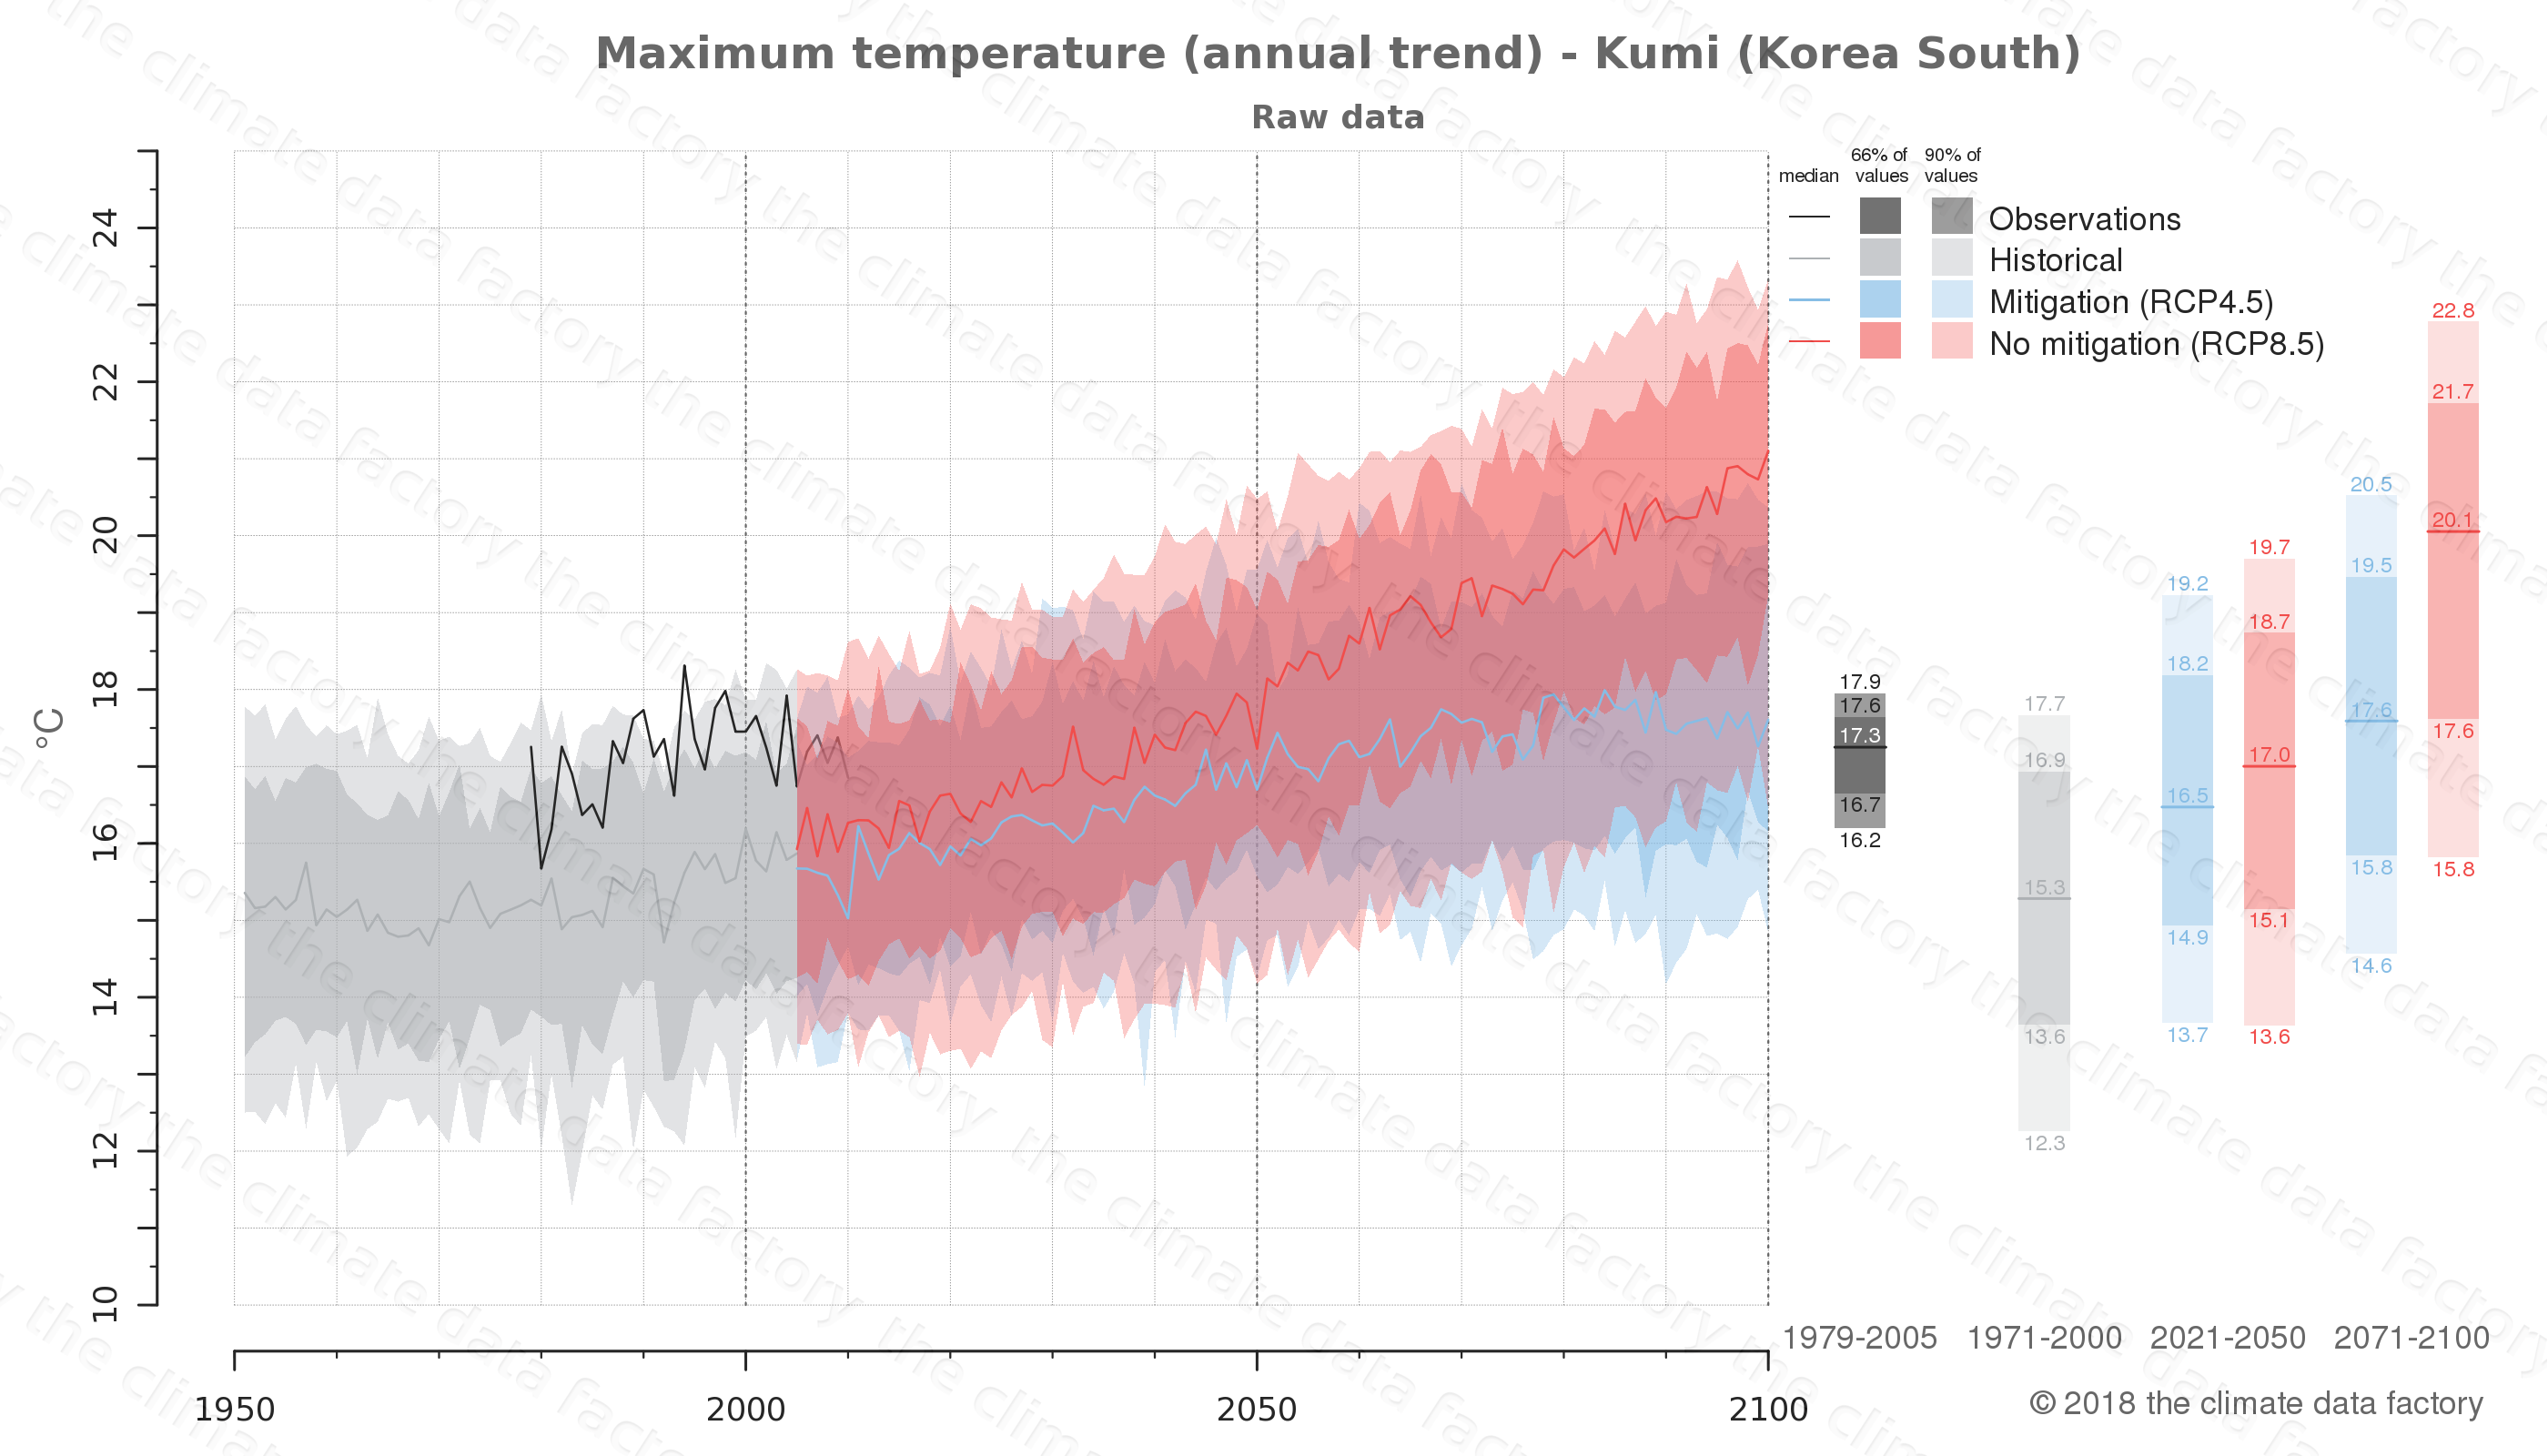 climate change data policy adaptation climate graph city data maximum-temperature kumi south korea